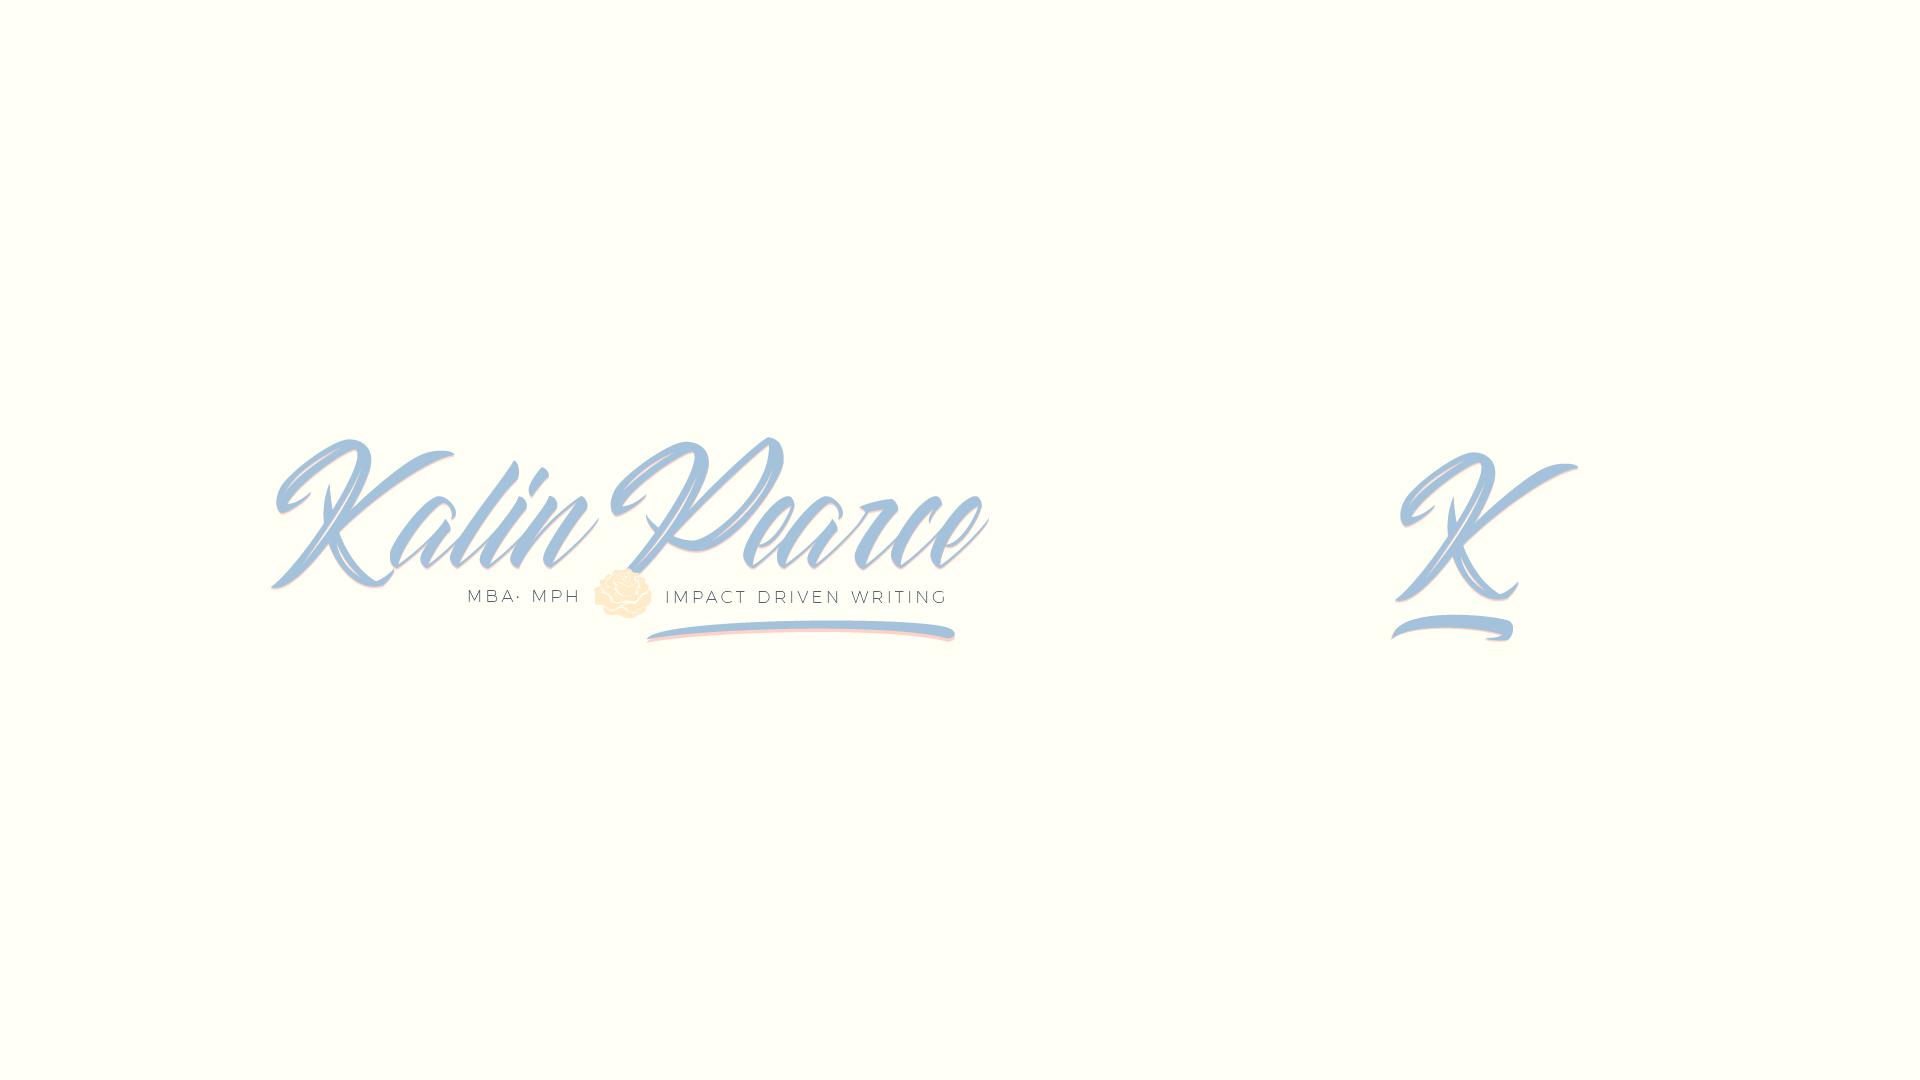 kailinpearceArtboard 2-100.jpg